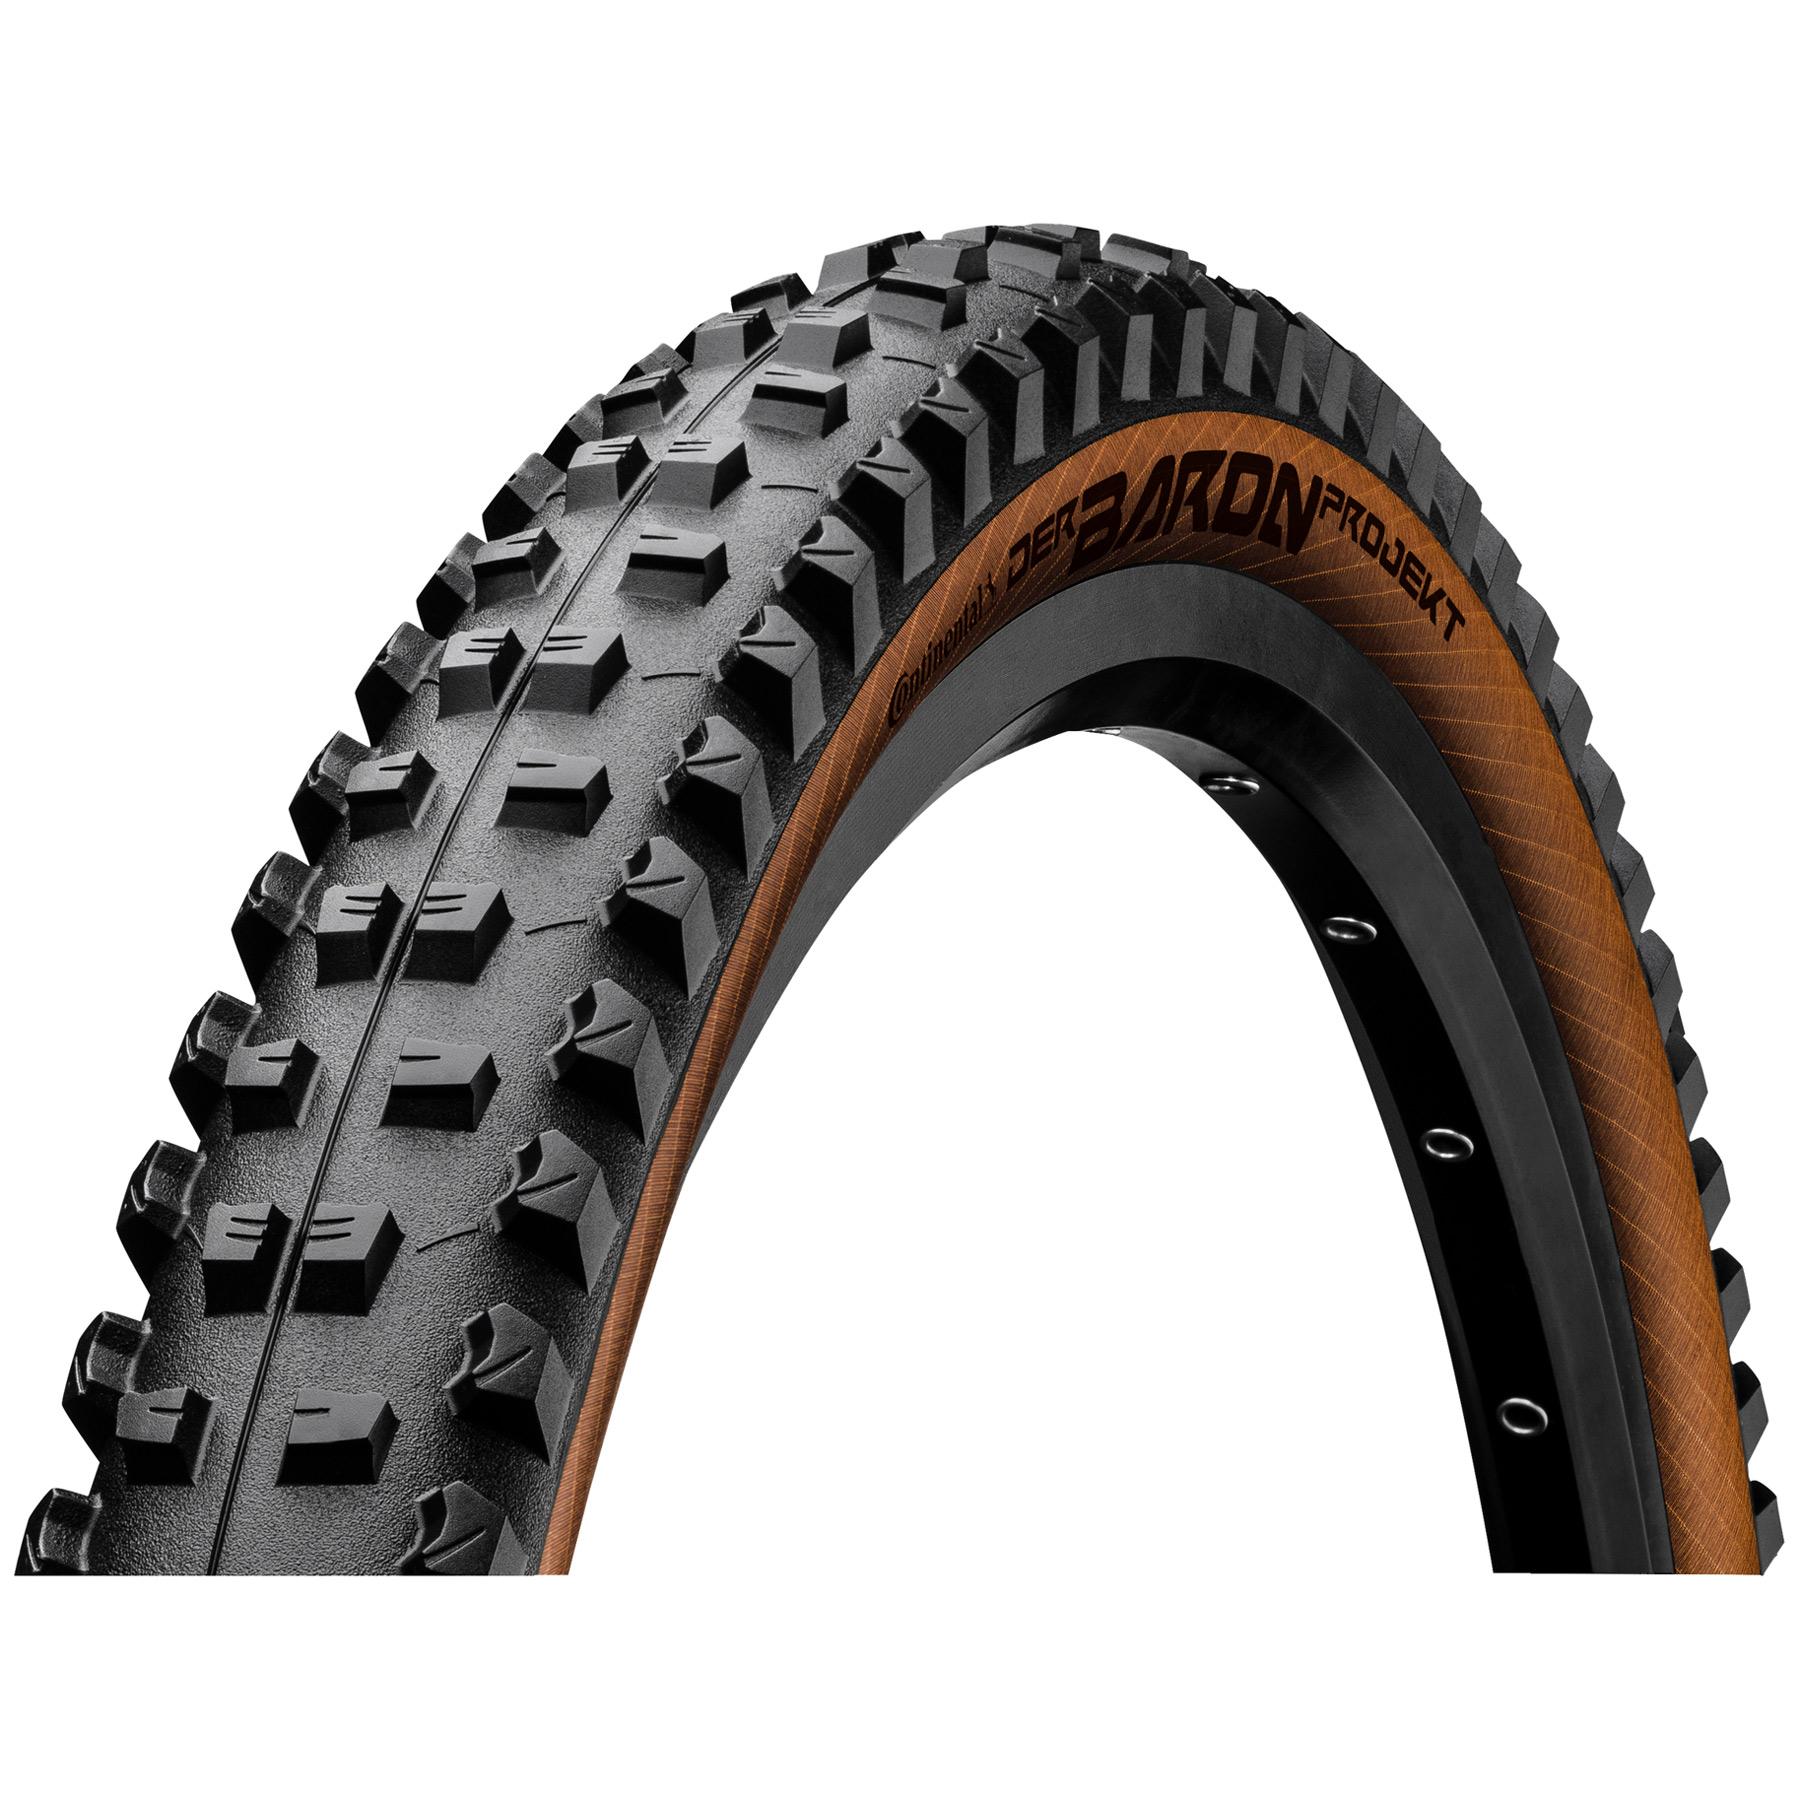 Continental Der Baron Projekt ProTection Apex MTB Folding Tire - 29 x 2.4 Inch - black/bernstein